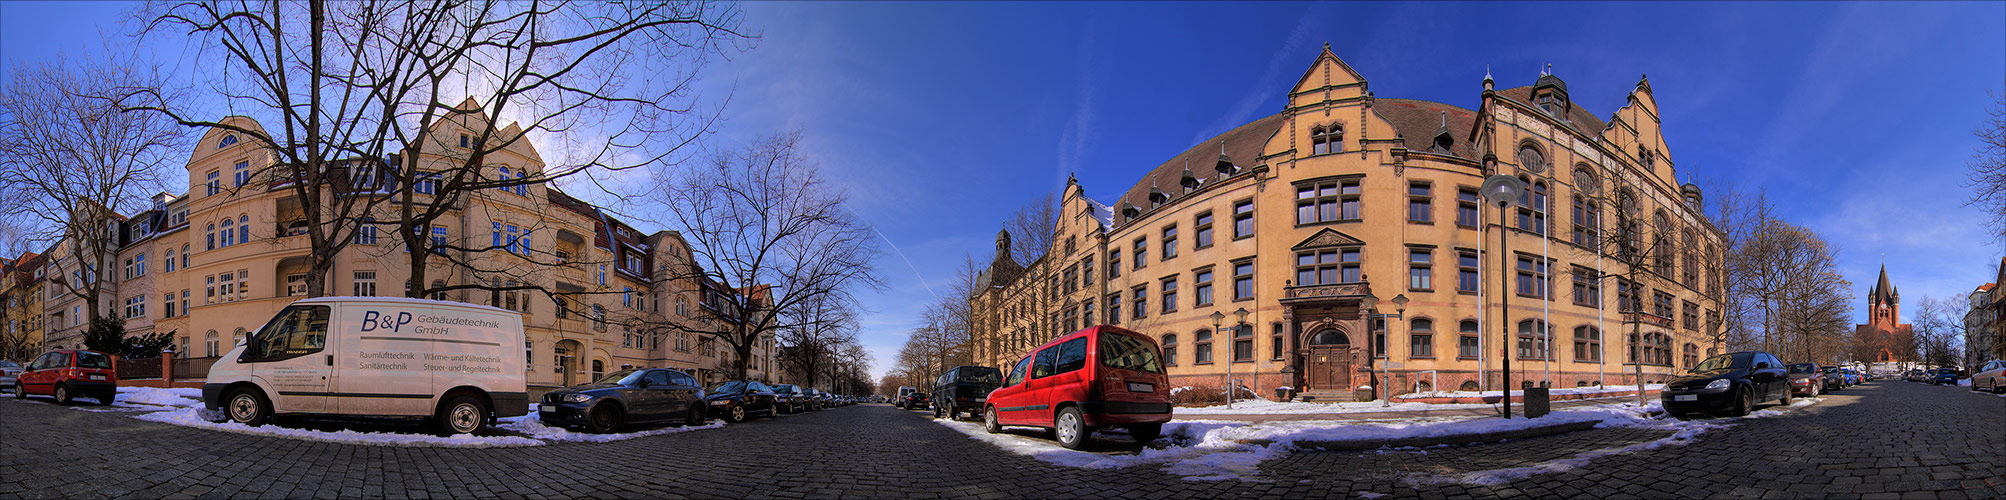 ehemaliges Regierungspräsidium Halle